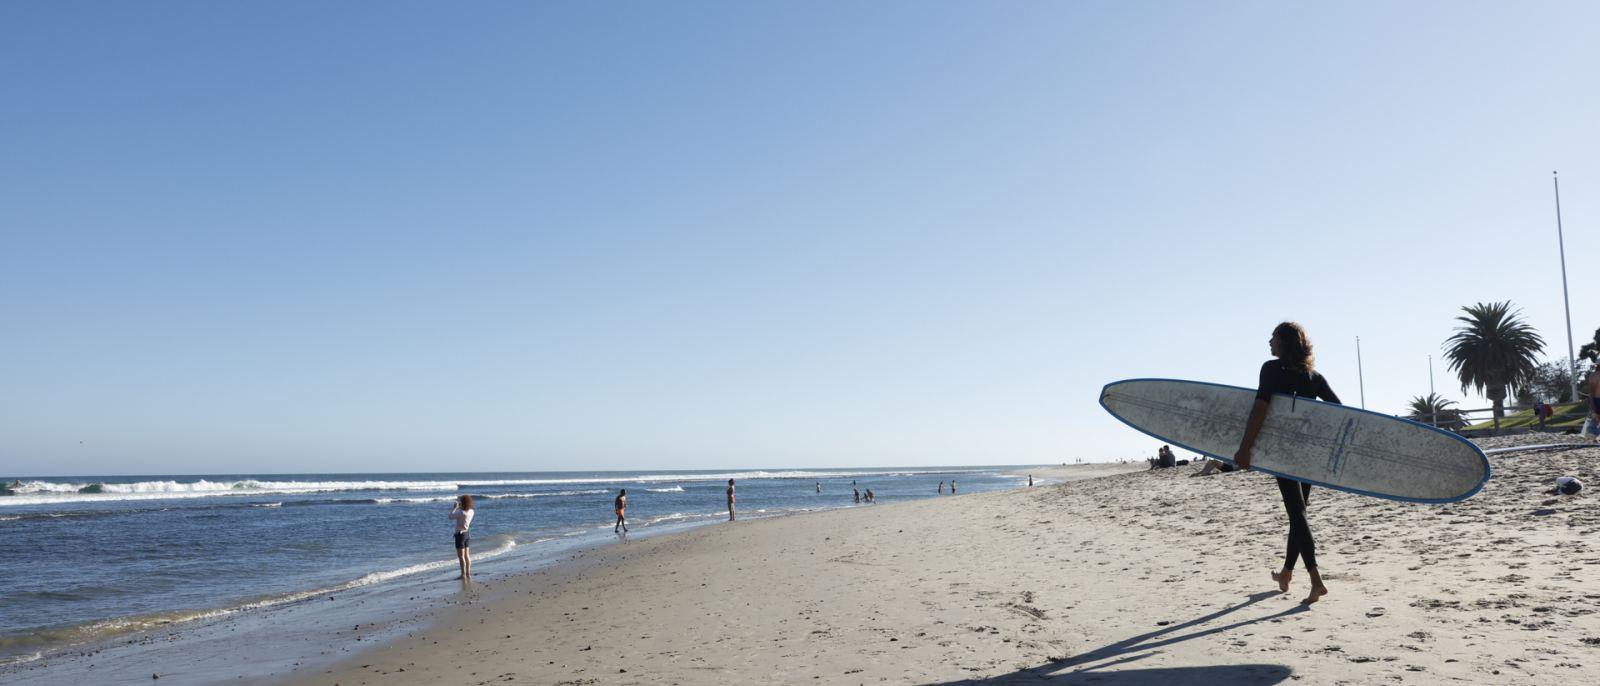 Malibu_Surfrider_Beach